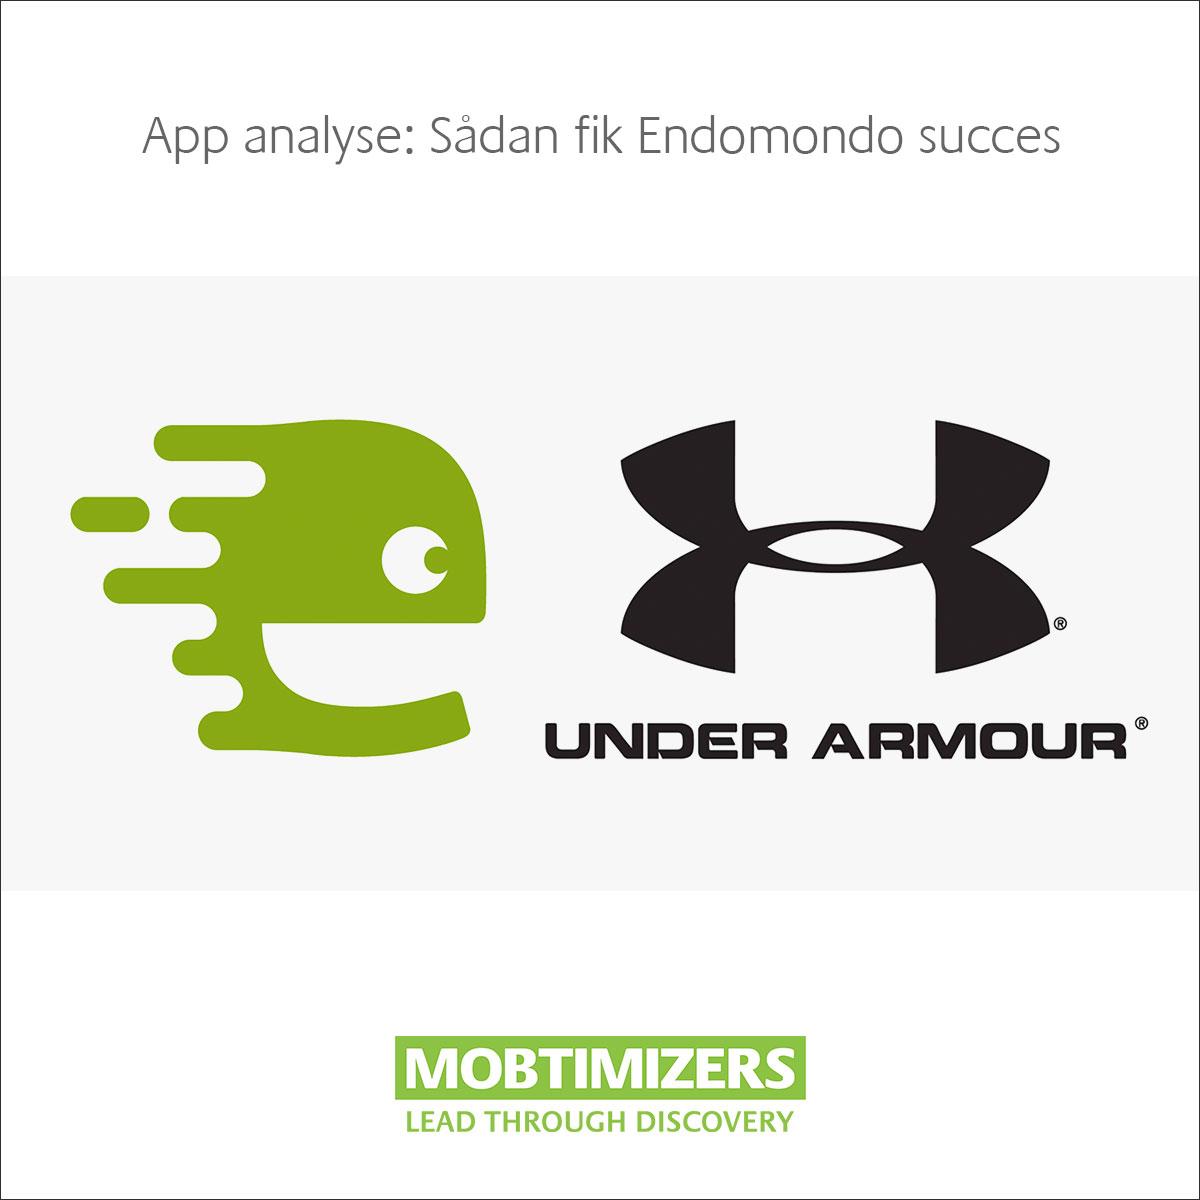 App analyse: Sådan fik Endomondo succes - App & Mobil strategi - Endomondo købt af Under Armor